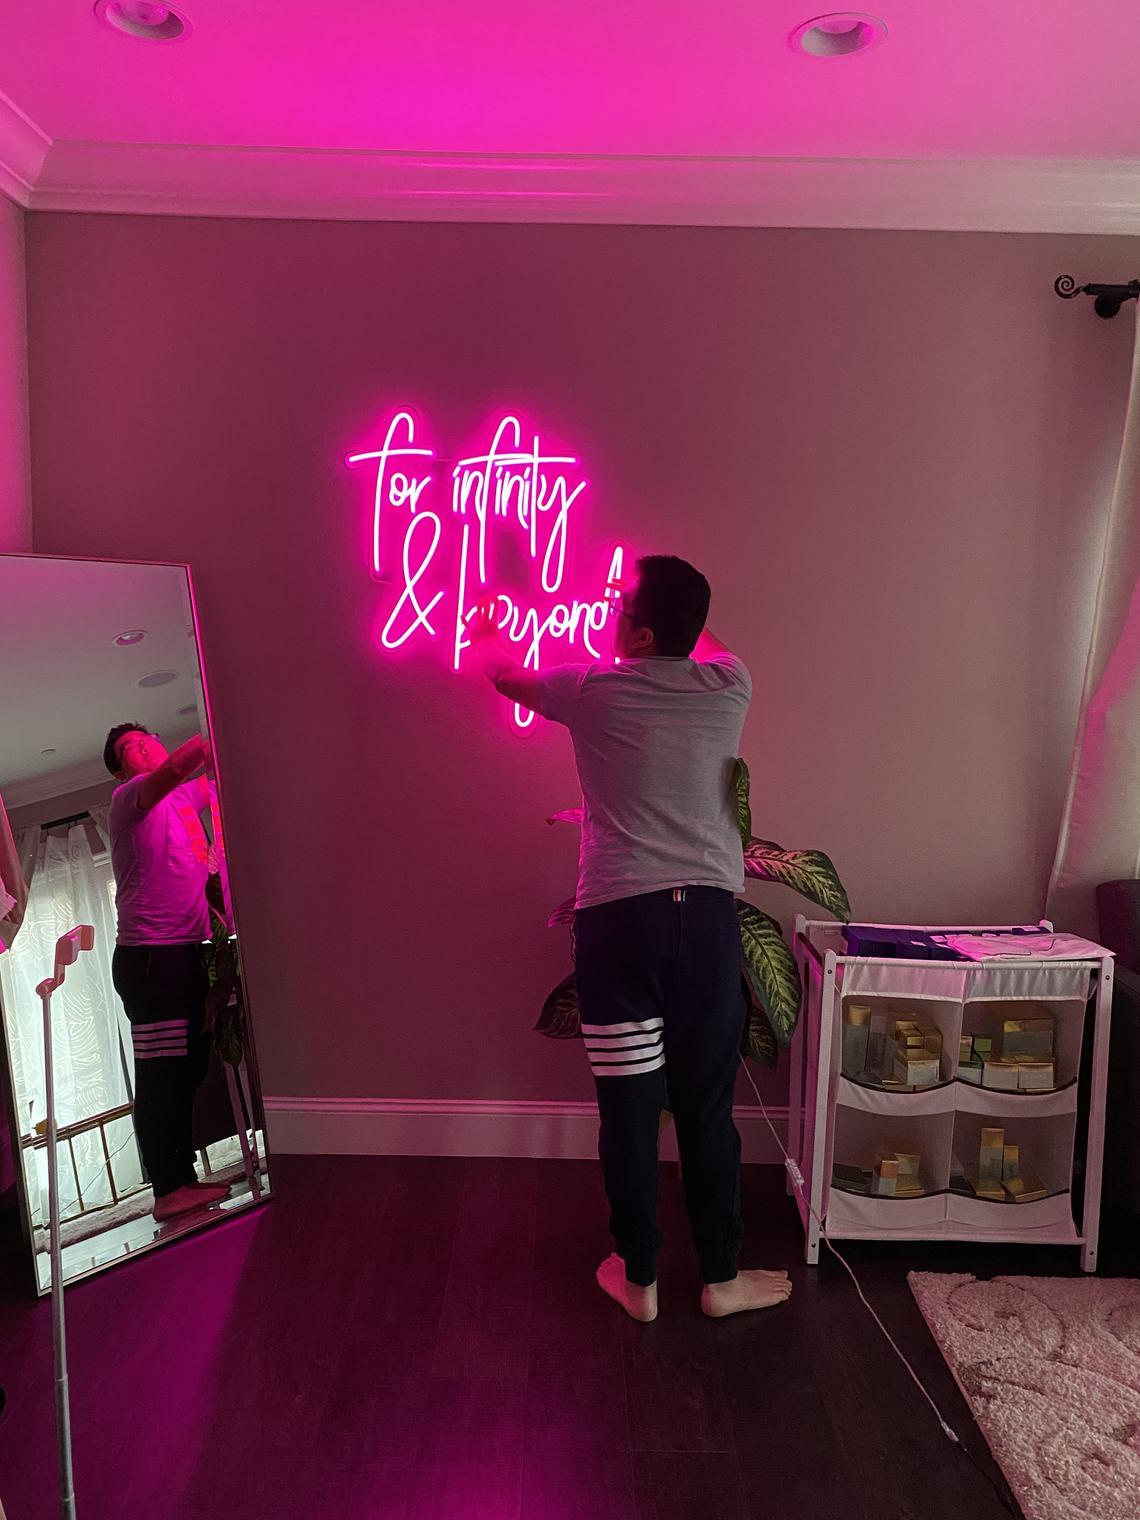 Custom Neon Sign/ Handmade Neon Sign/Đèn Neon theo yêu cầu